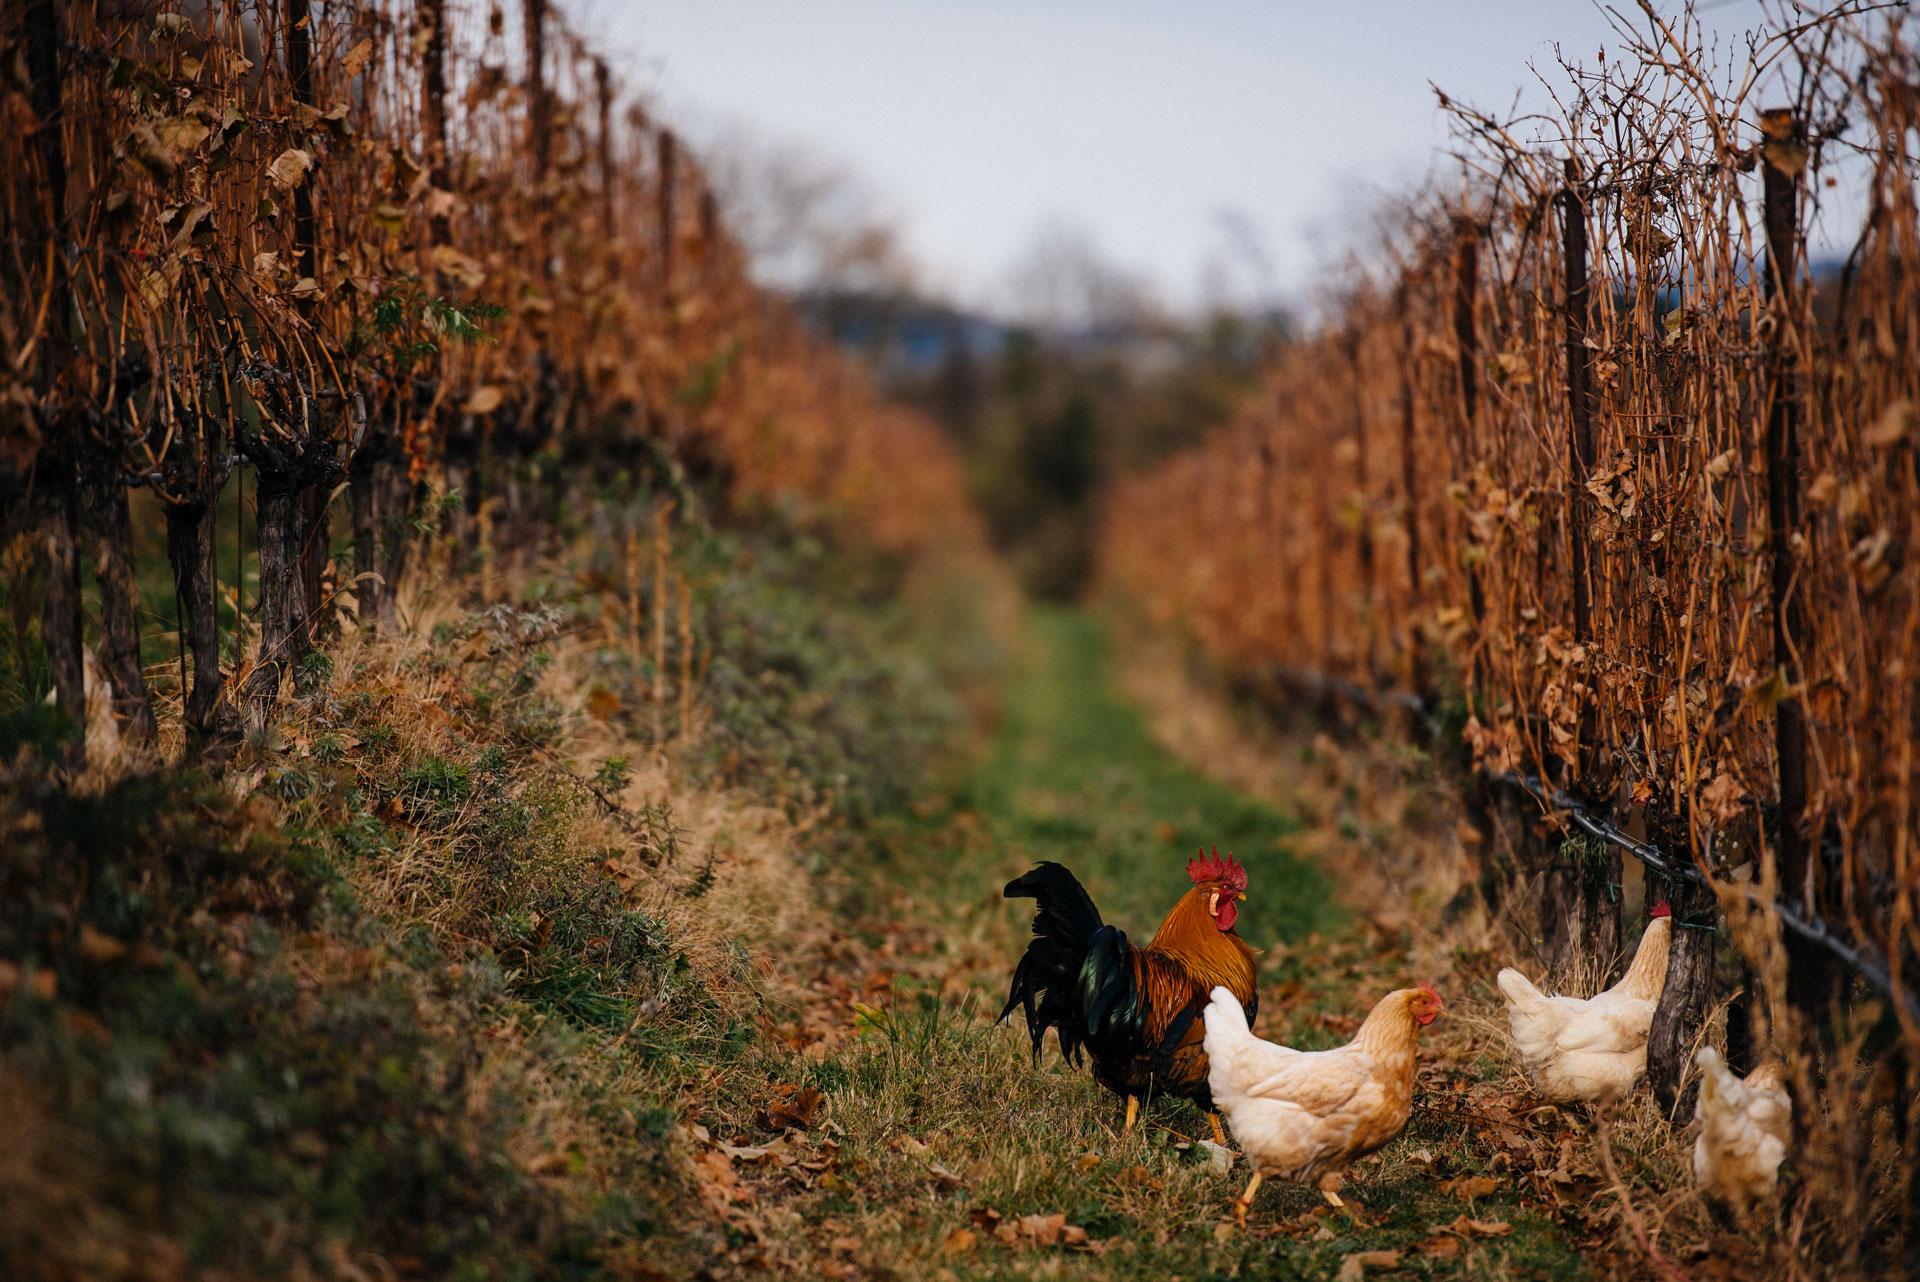 Breeding fowls   Manincor   Caldaro   Alto Adige   Italy